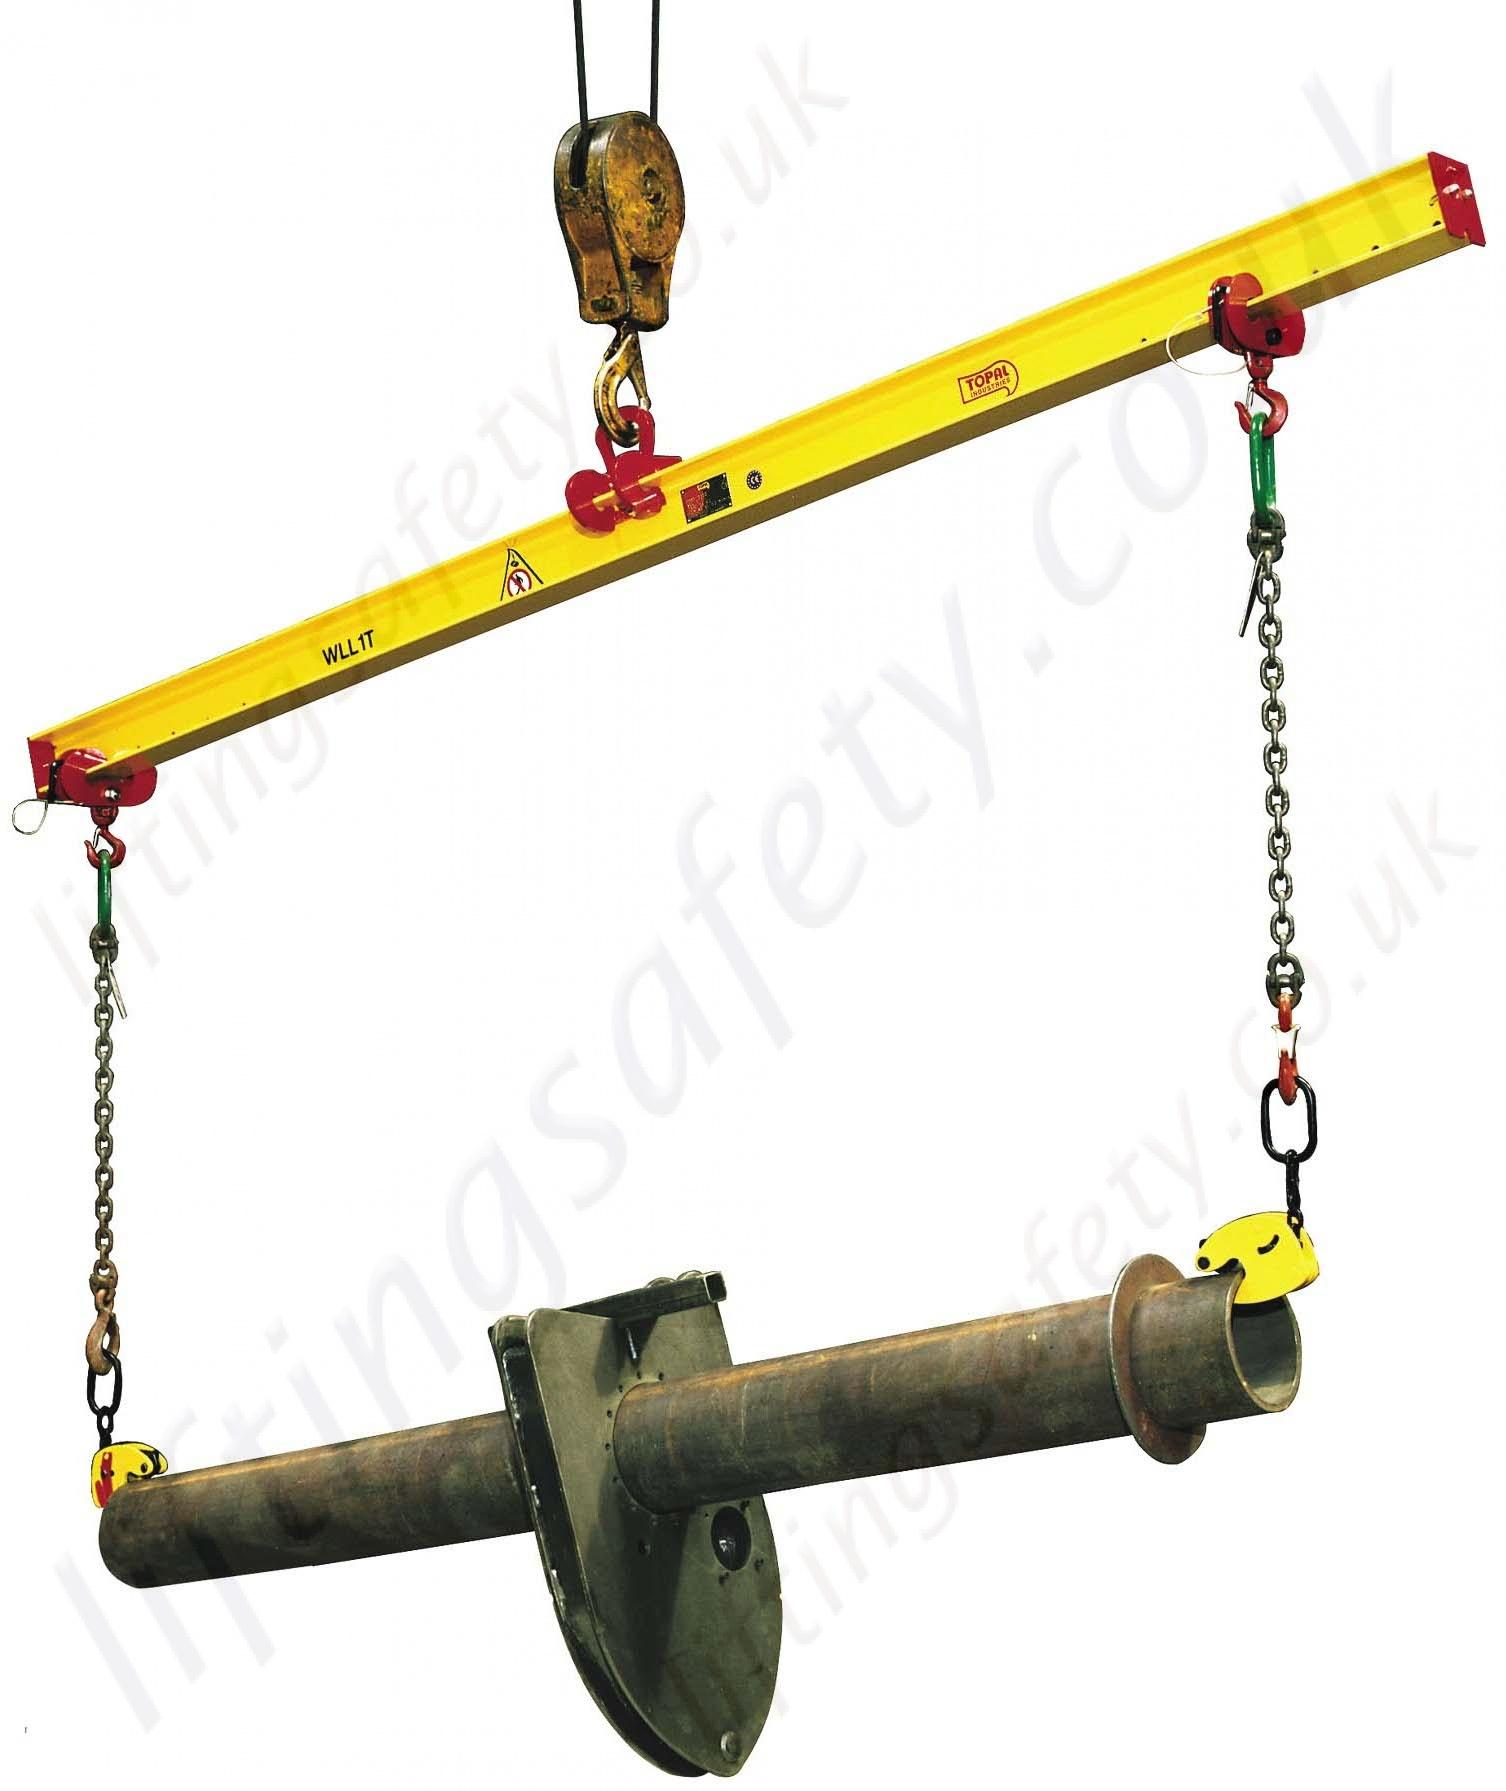 Tractel topal pbm adjustable single lifting beams pal beam for Motorized rotating crane hook